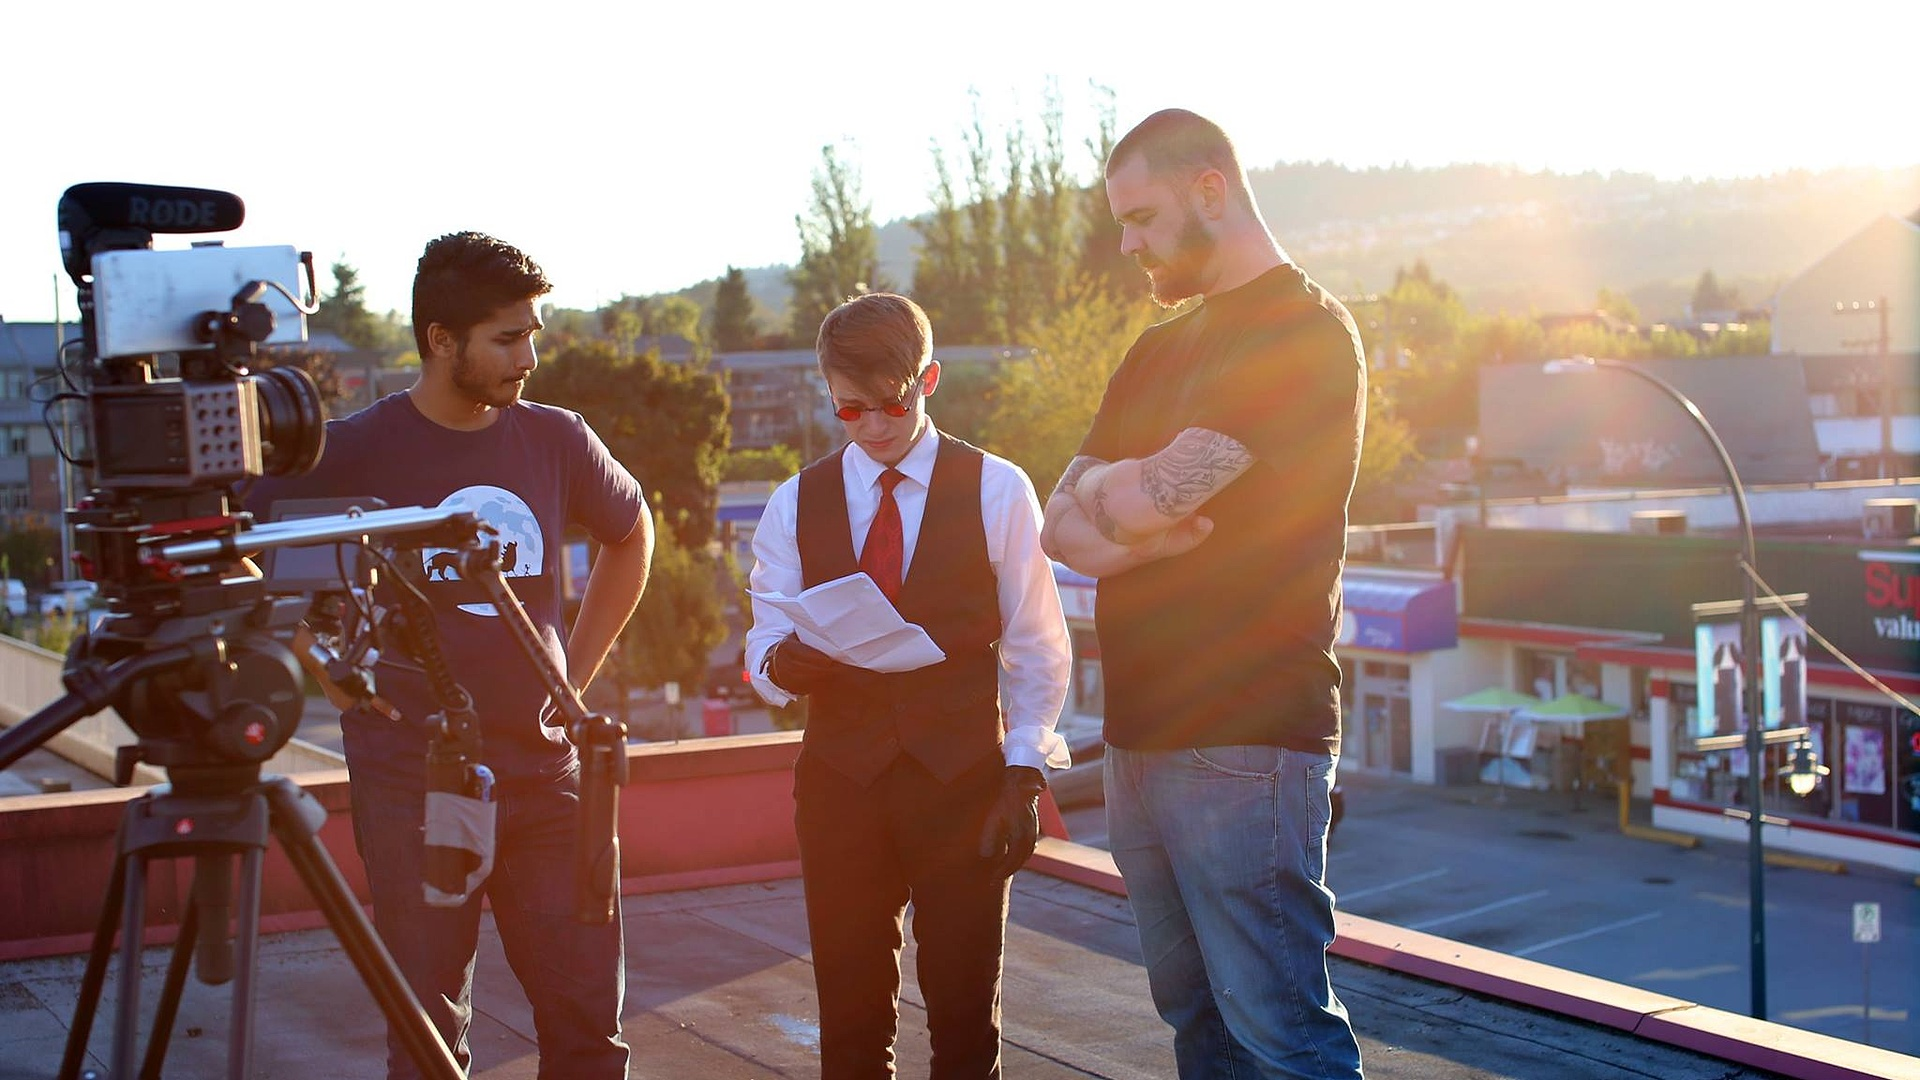 Behind The Scenes - 1